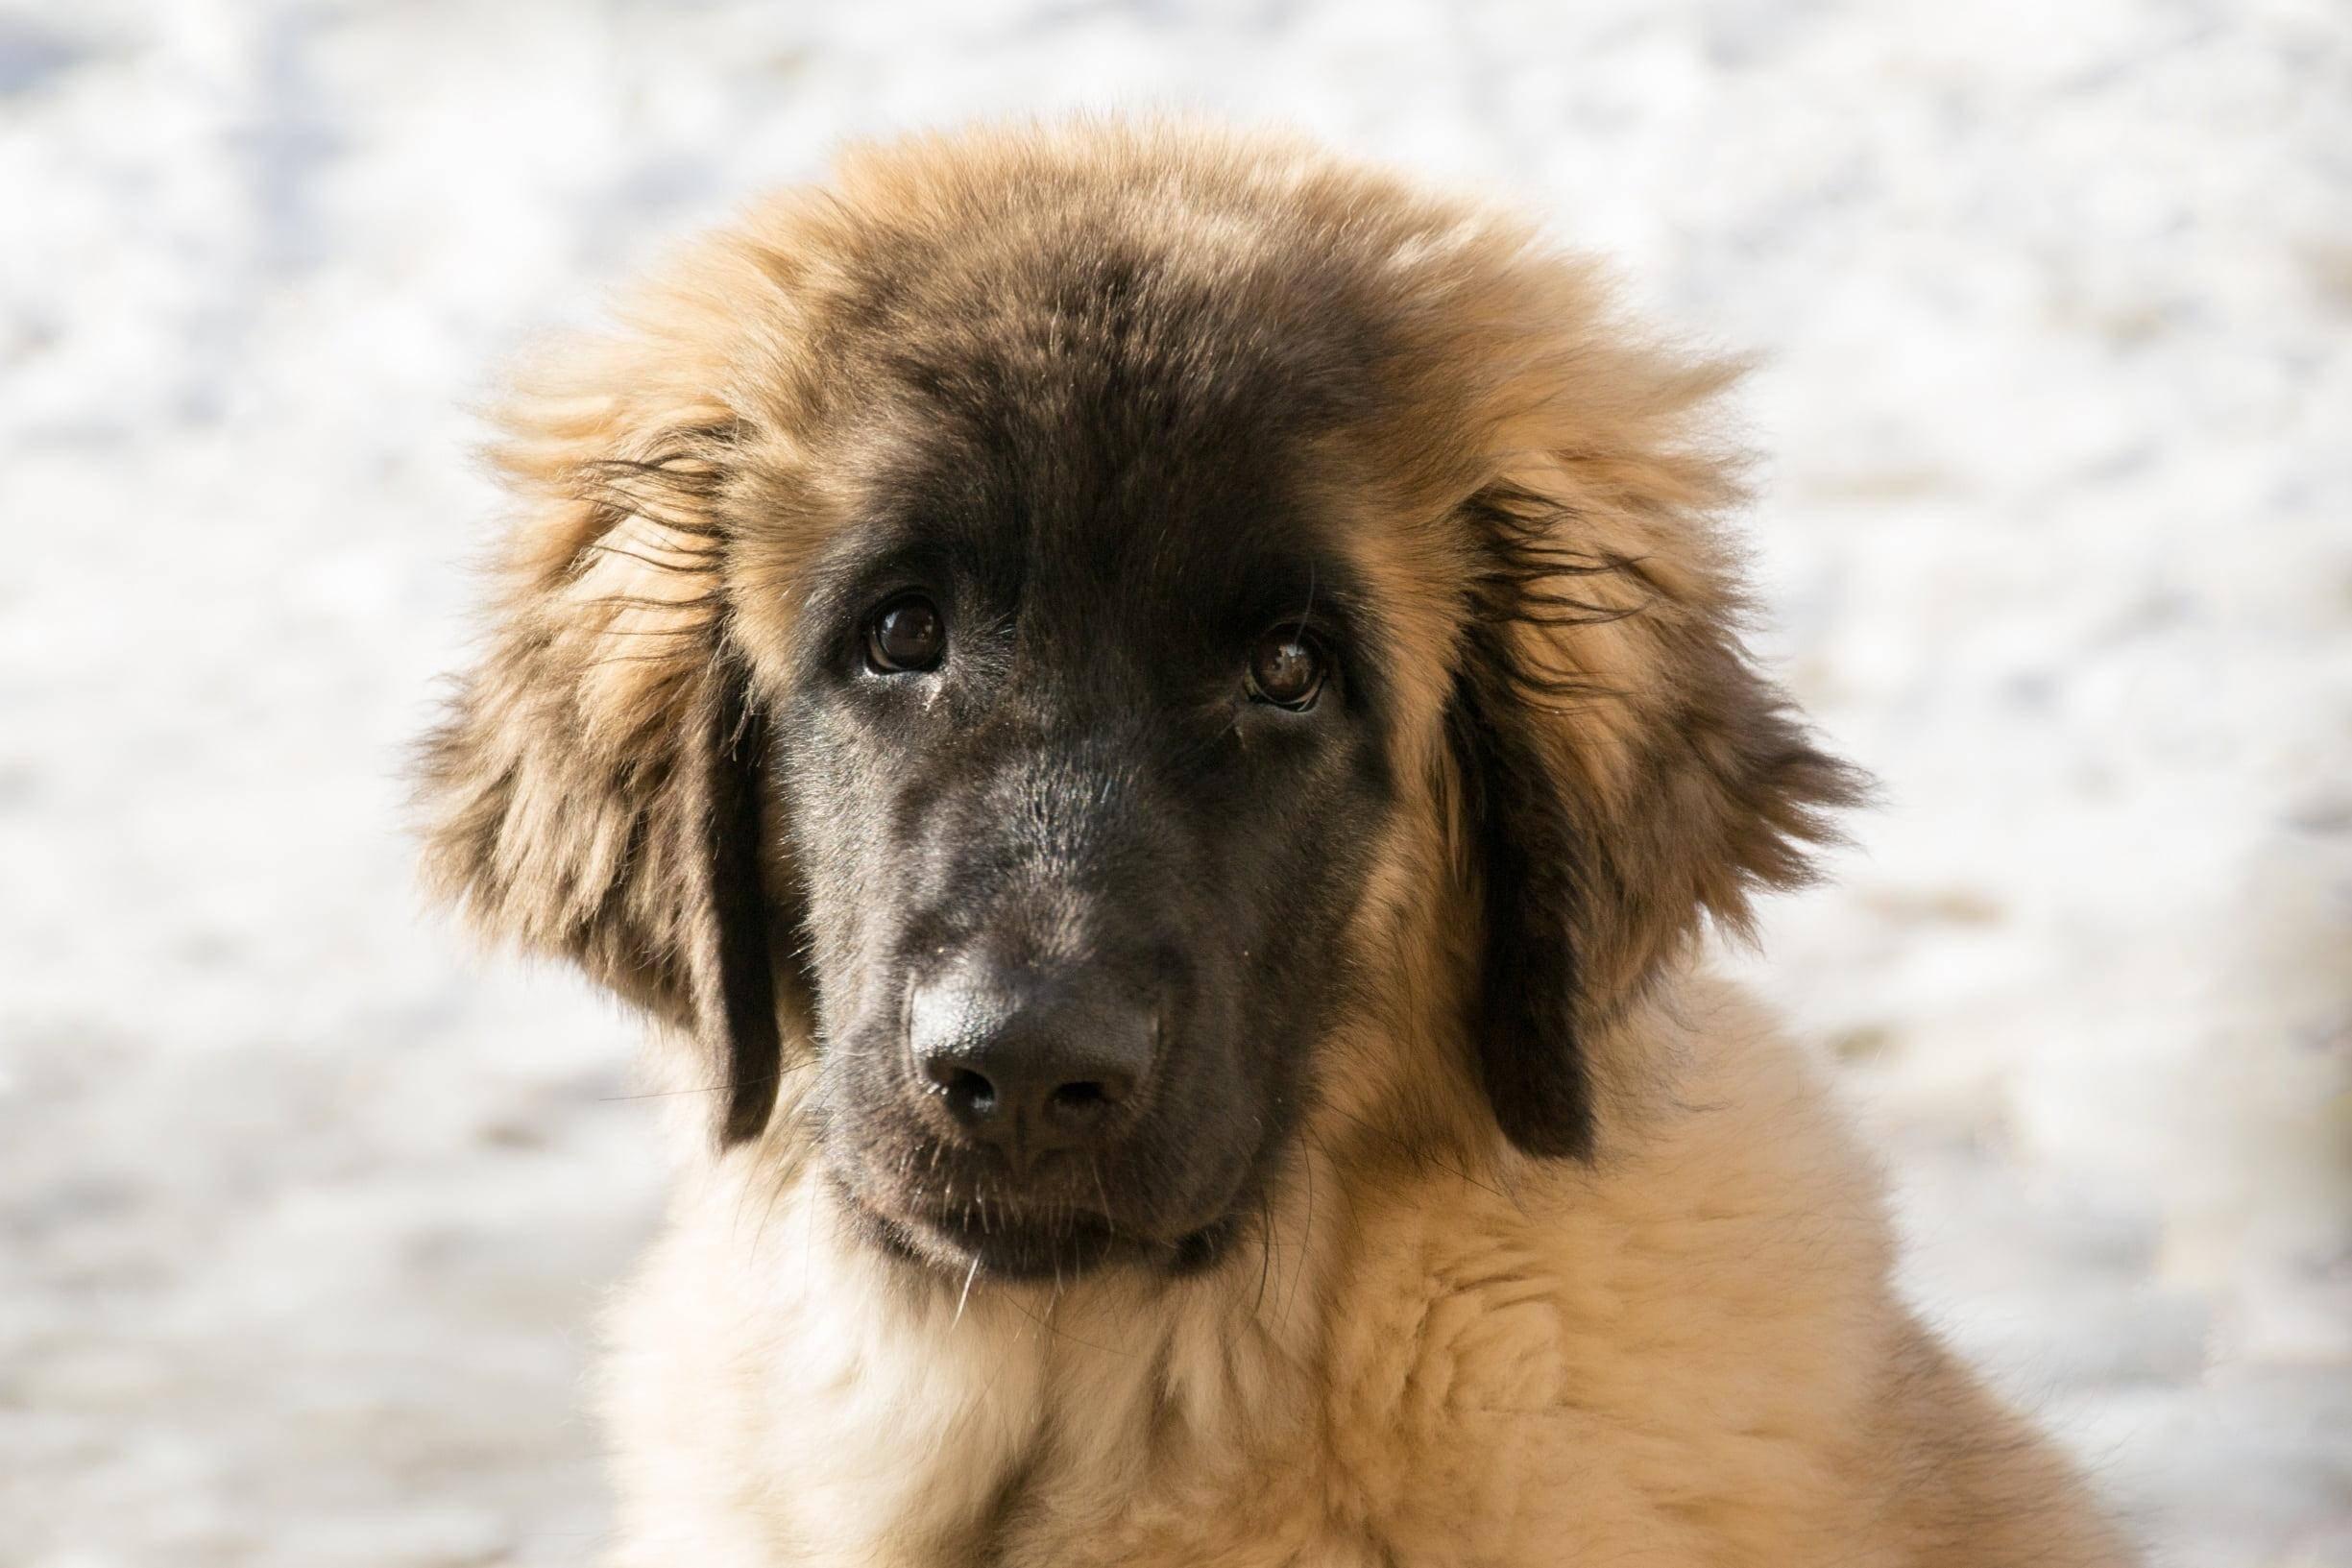 Порода собак леонбергер: описание и стандарт, характер, отзывы